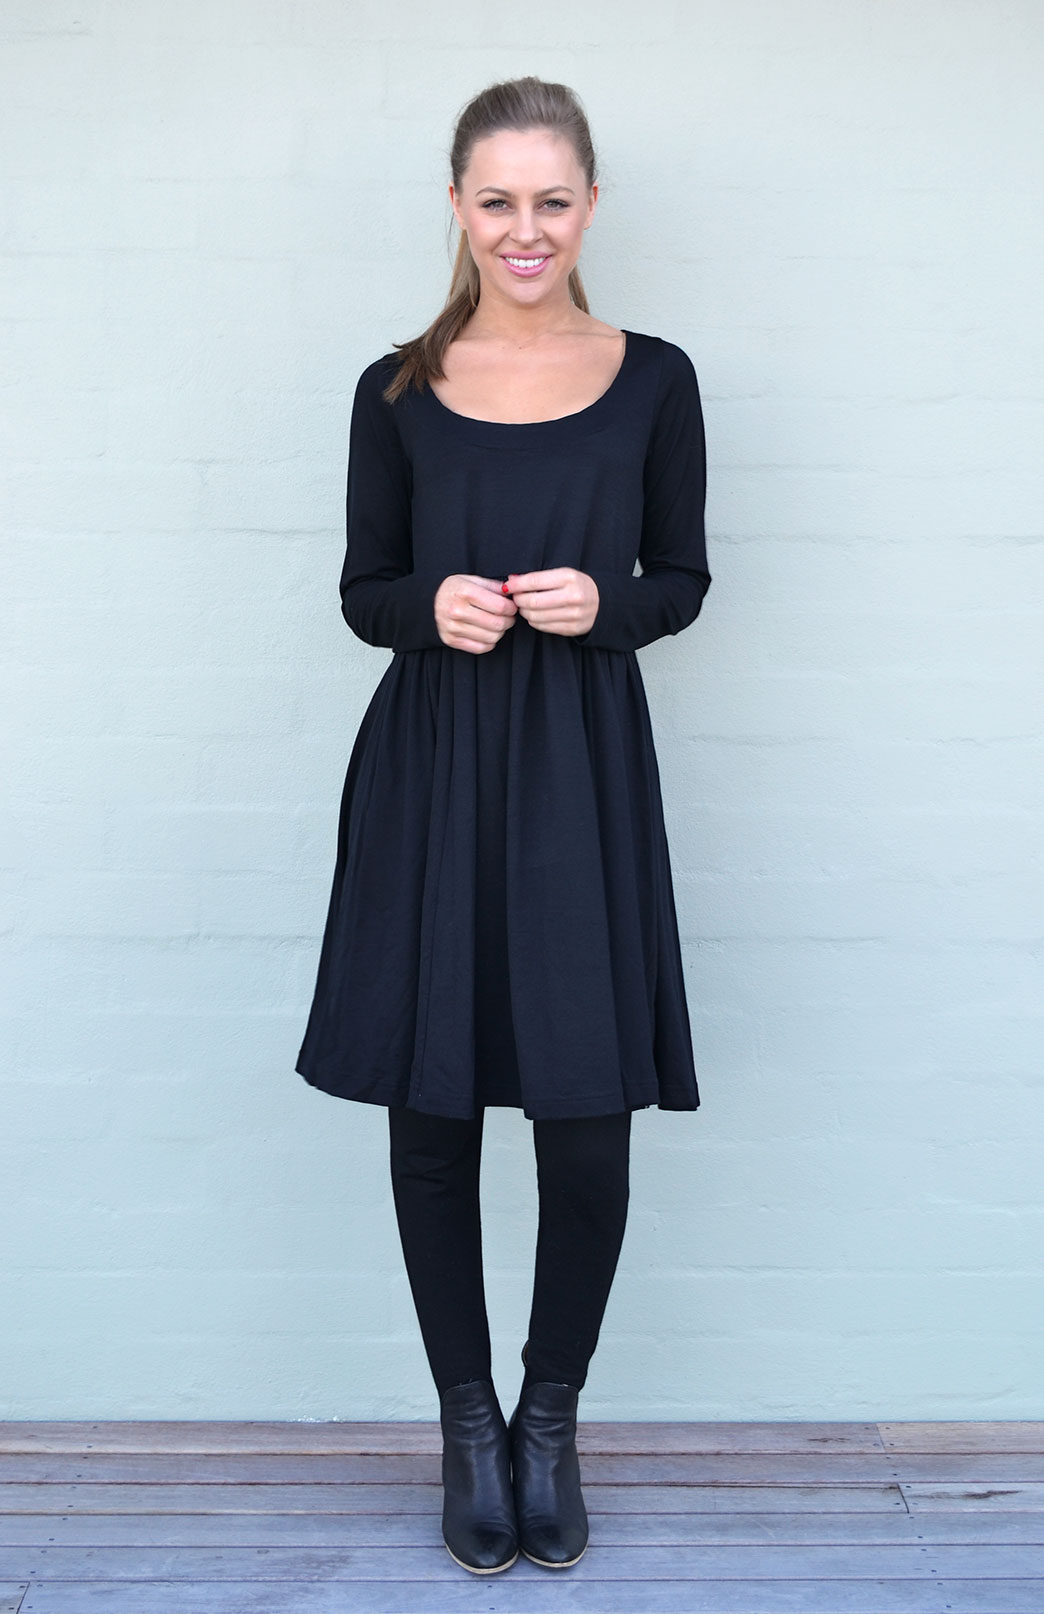 Gathered Dress - Long Sleeved - Women's Black Long Sleeved Wool Dress with Gathered Waistline - Smitten Merino Tasmania Australia